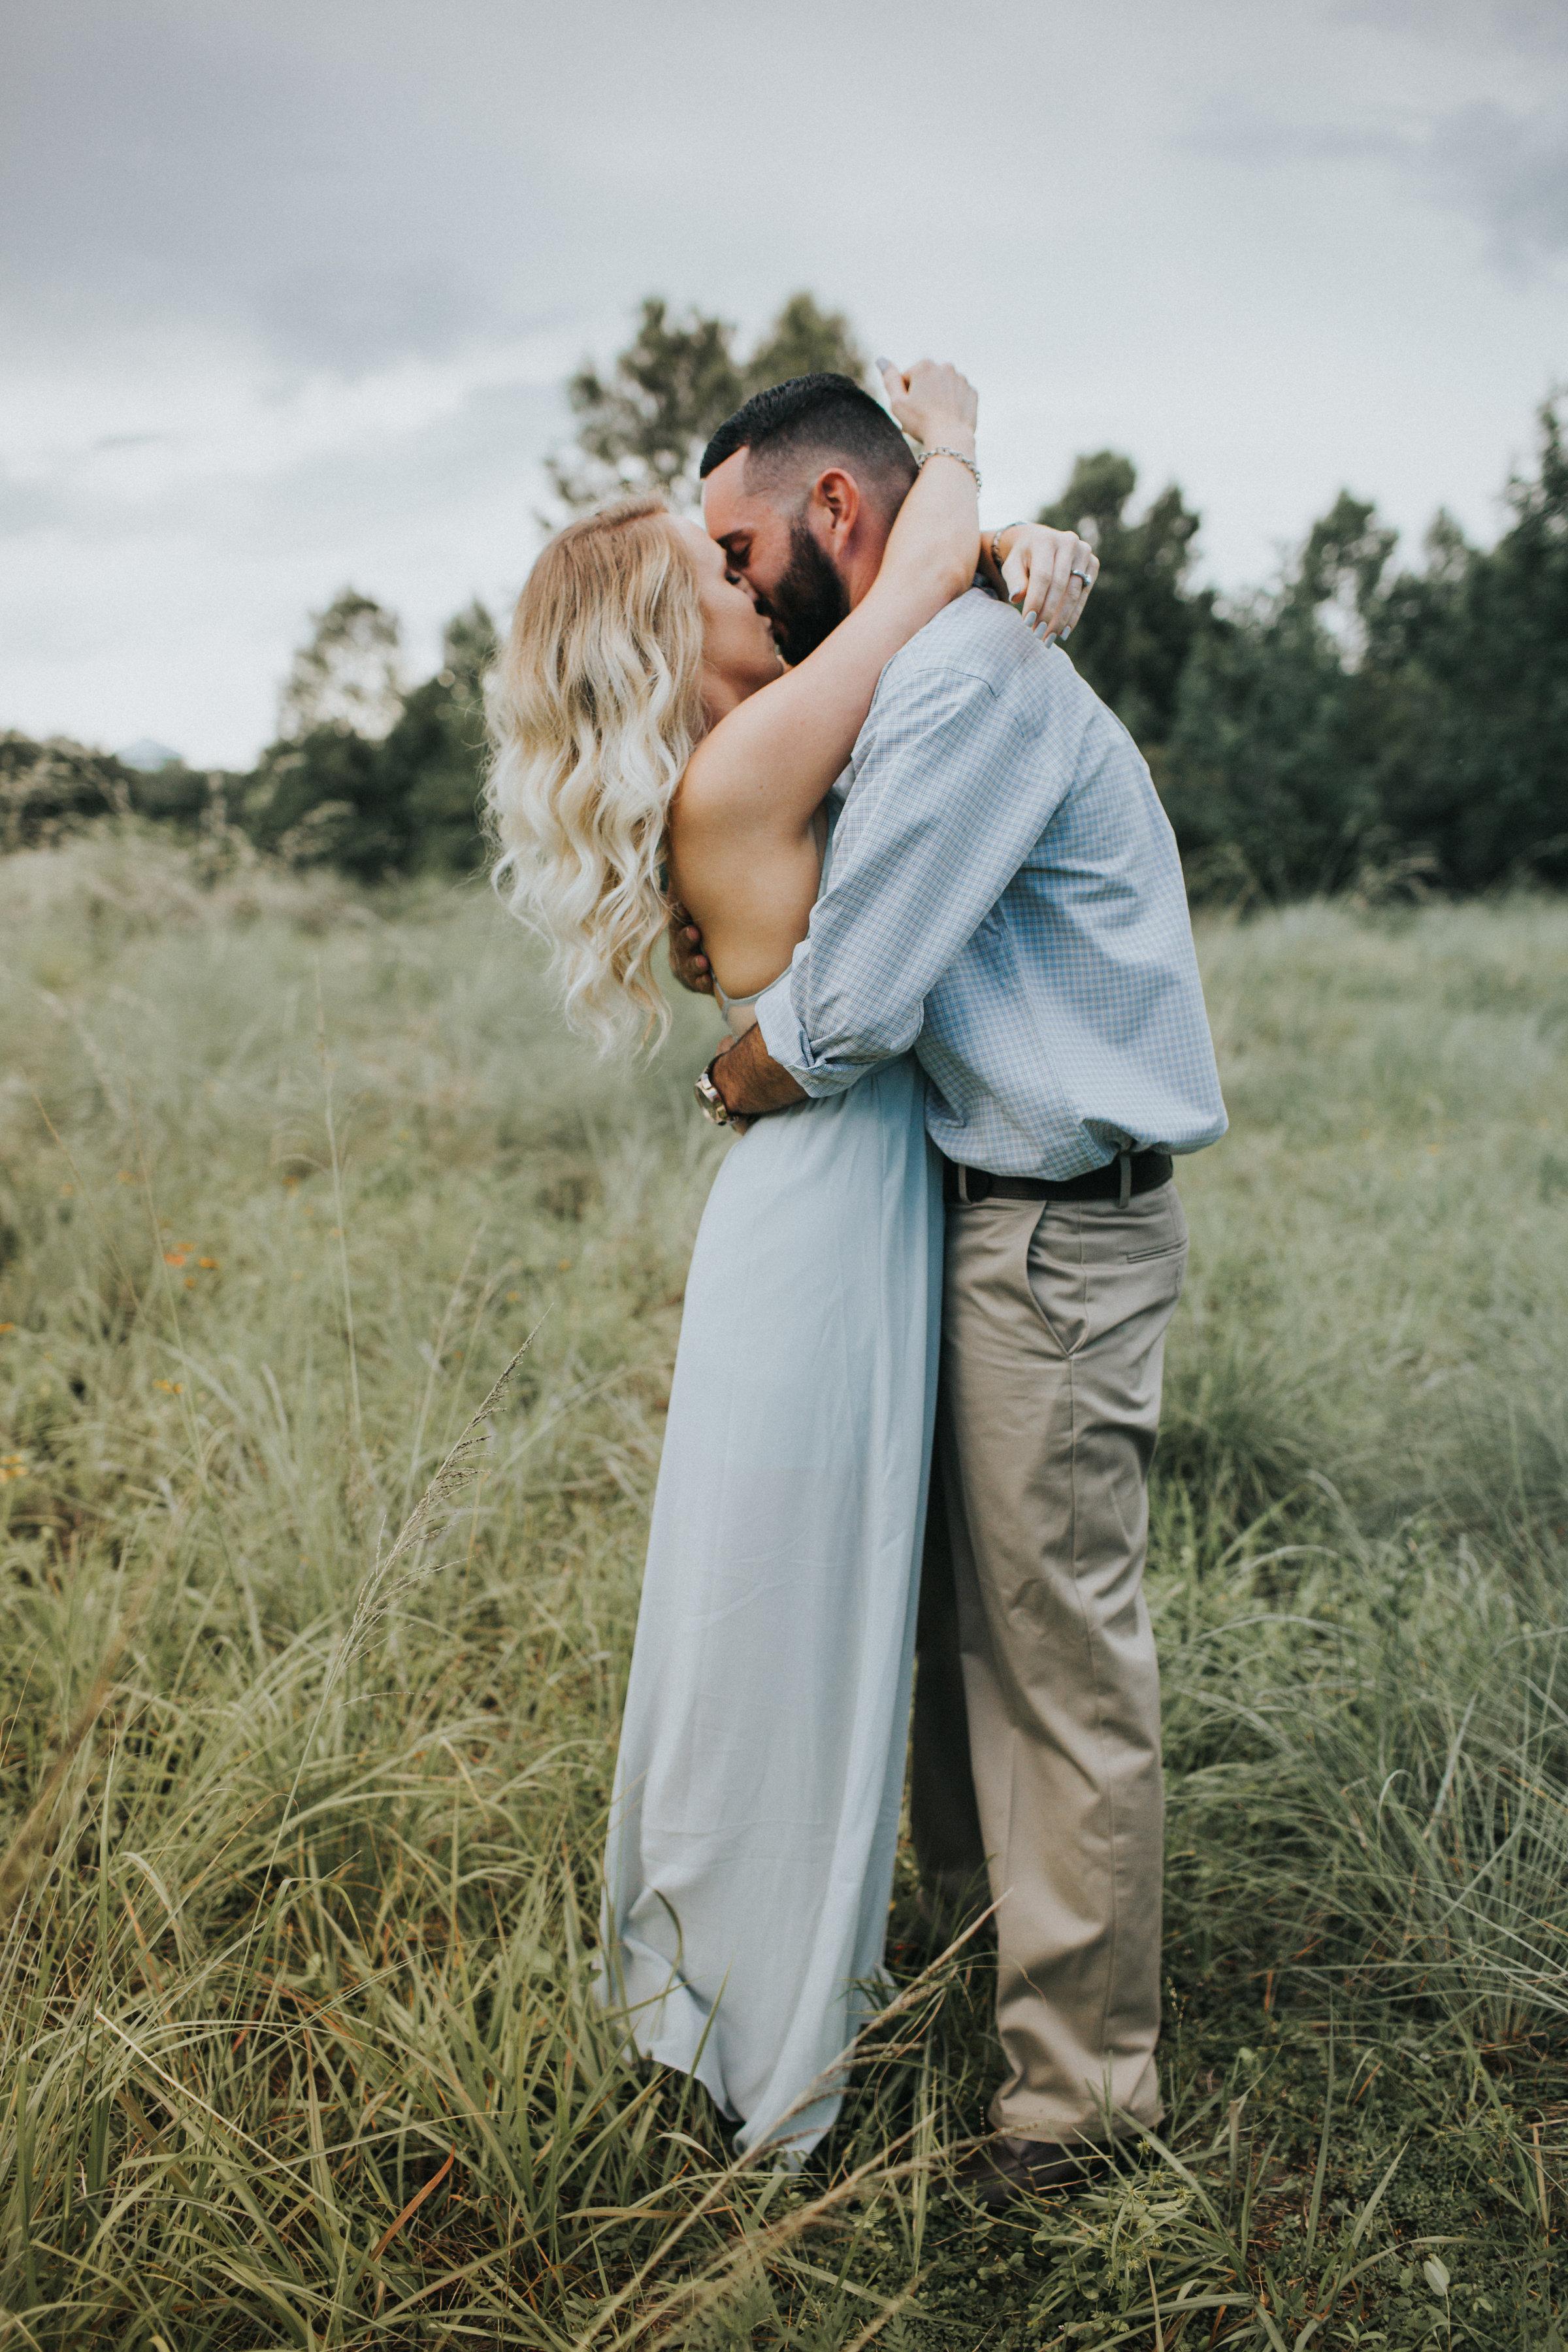 Alexandra's Proposal in Rio Verde, Arizona